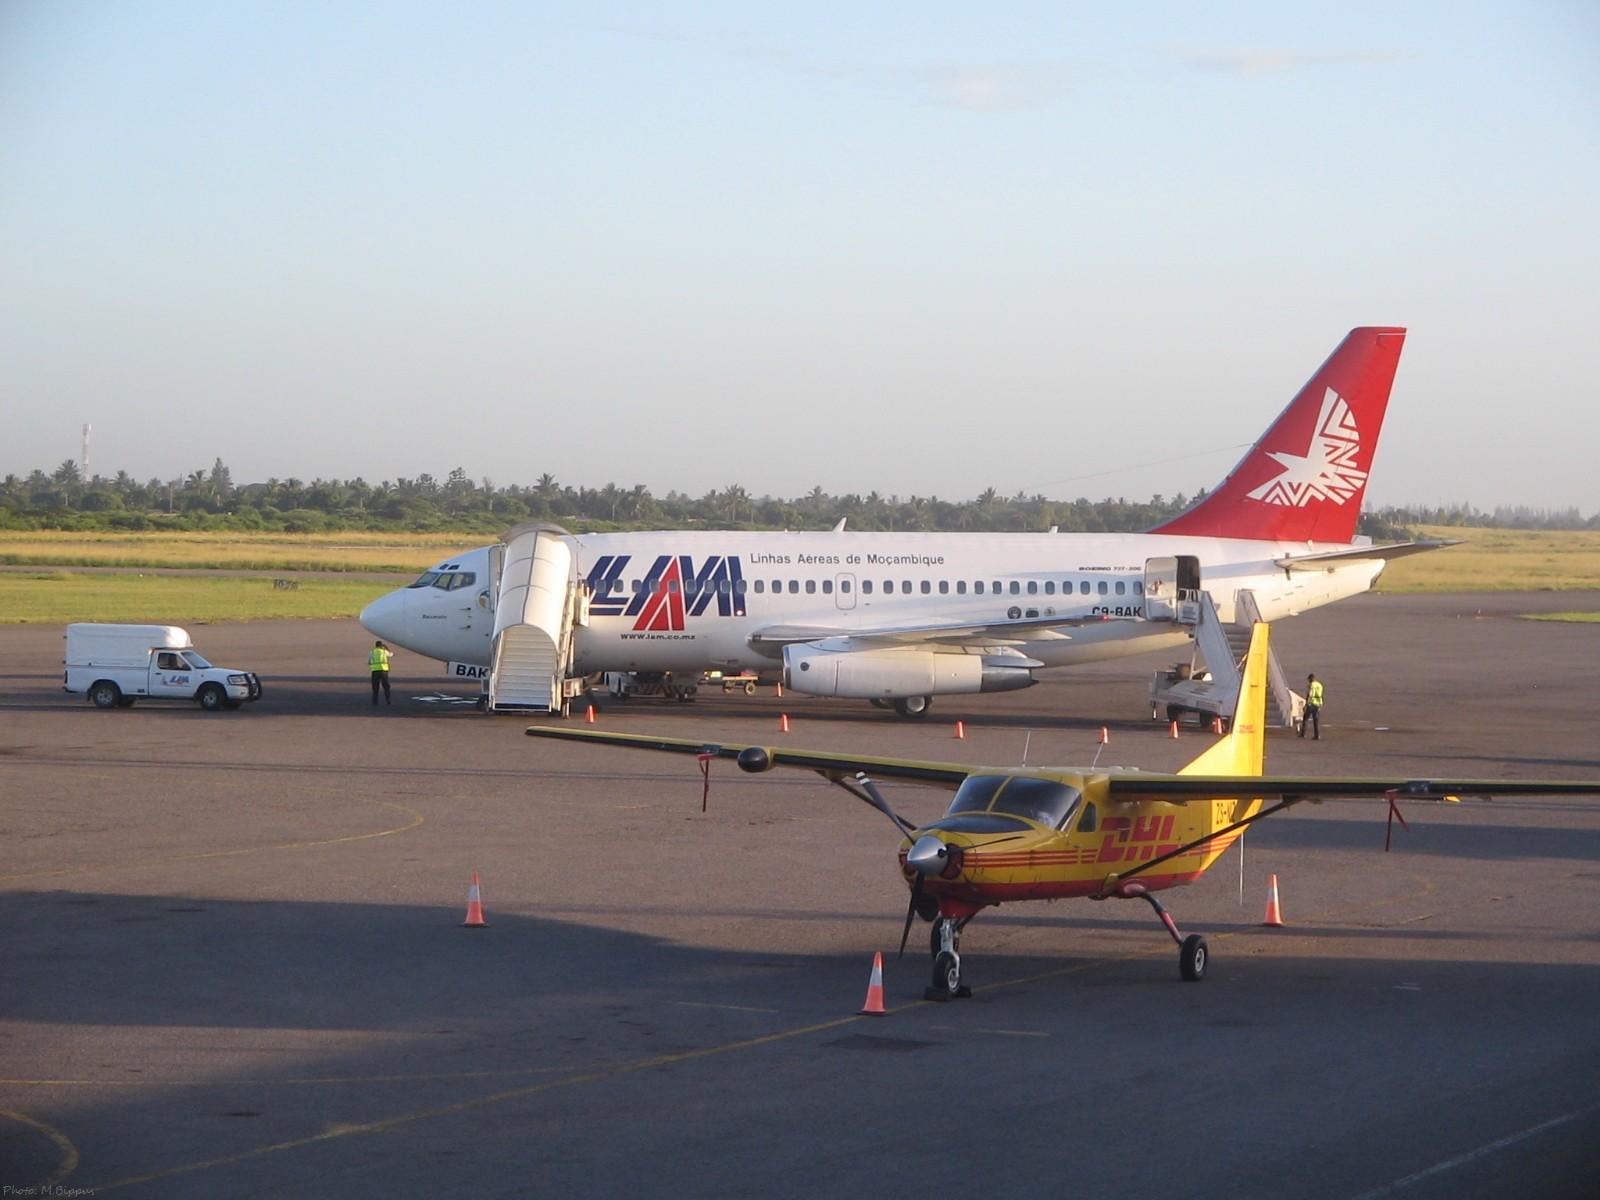 File:Maputo-airport-C9-BAK-LAMandDHL.jpg - Wikimedia Commons